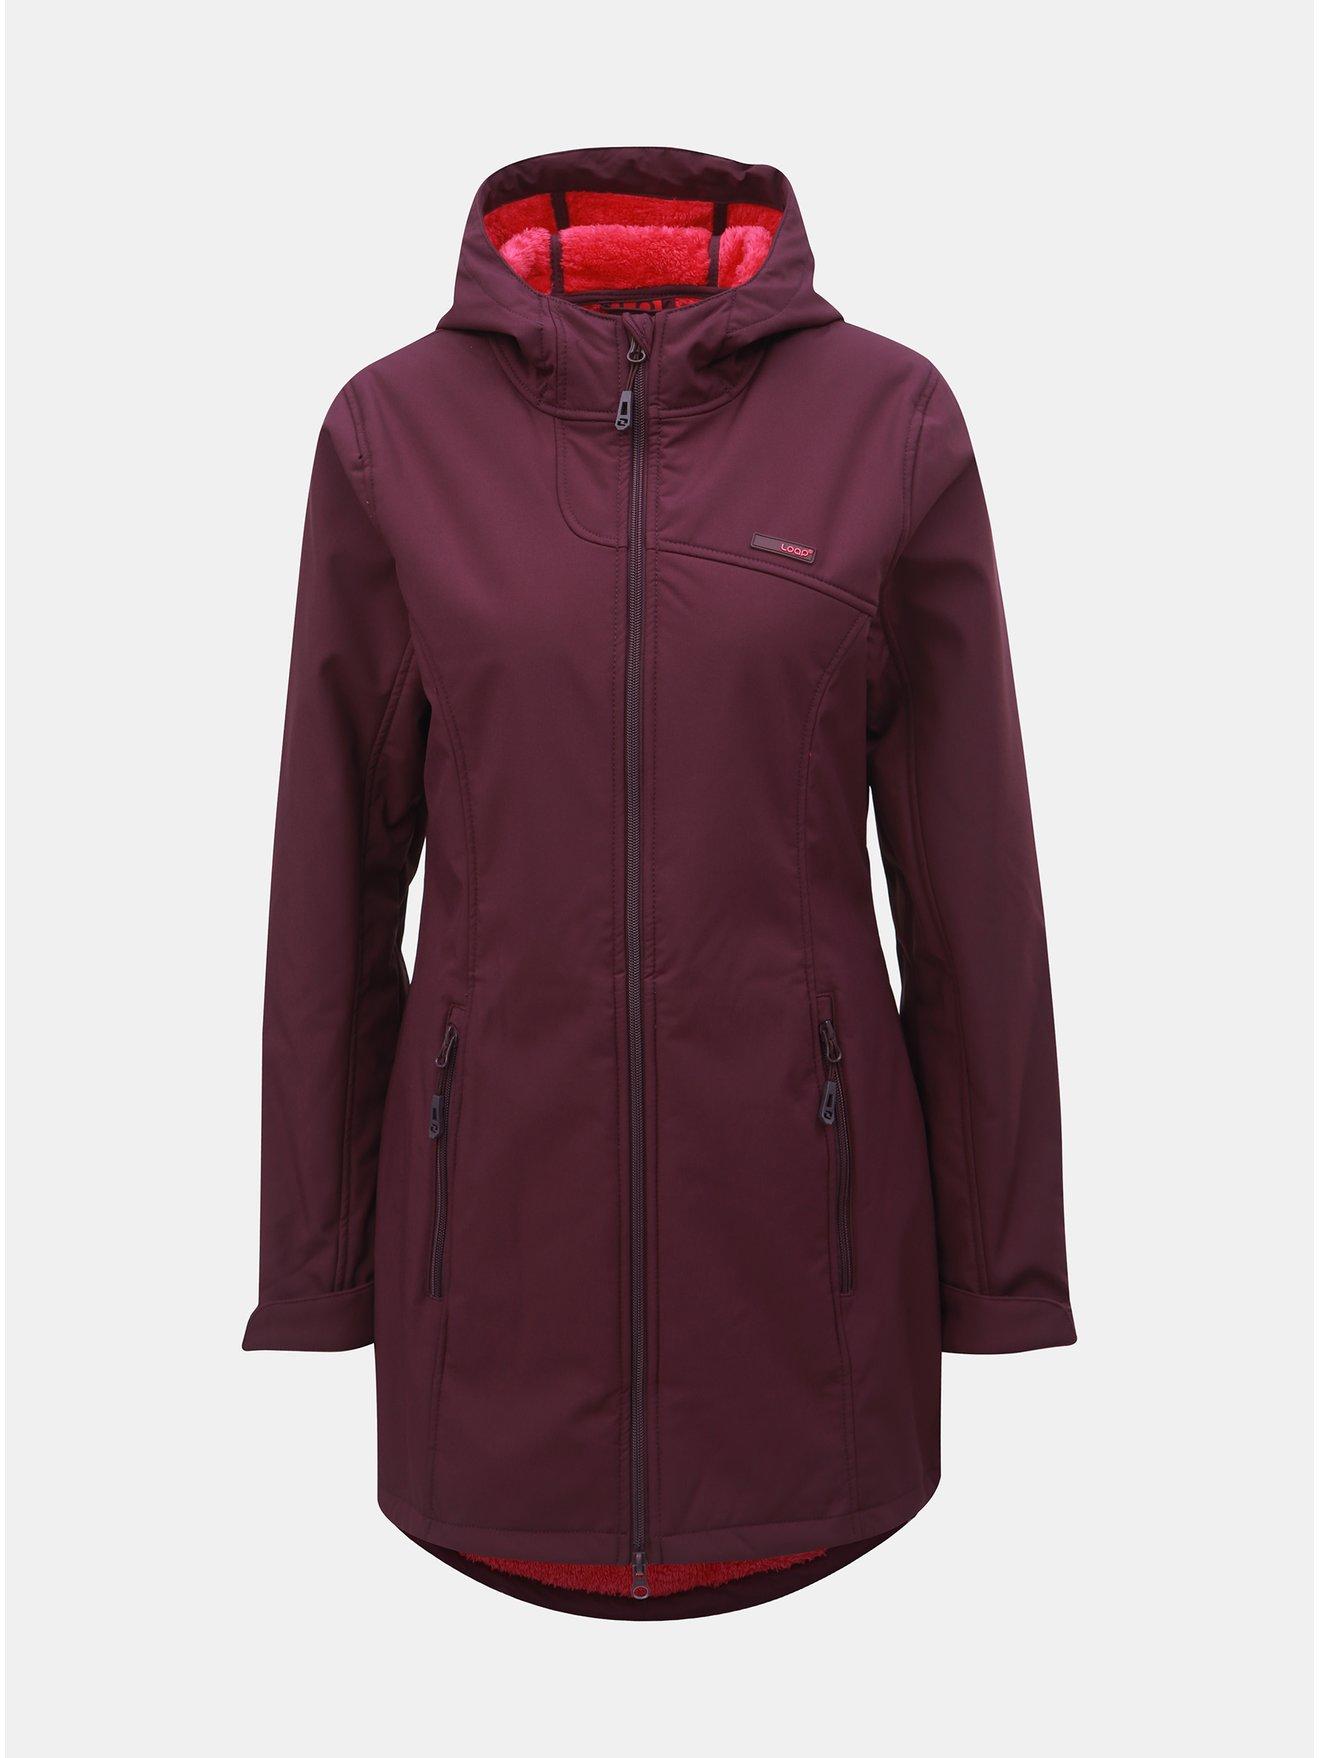 Fialový dámský softshellový nepromokavý lehký kabát LOAP Lavinia 911acabaac